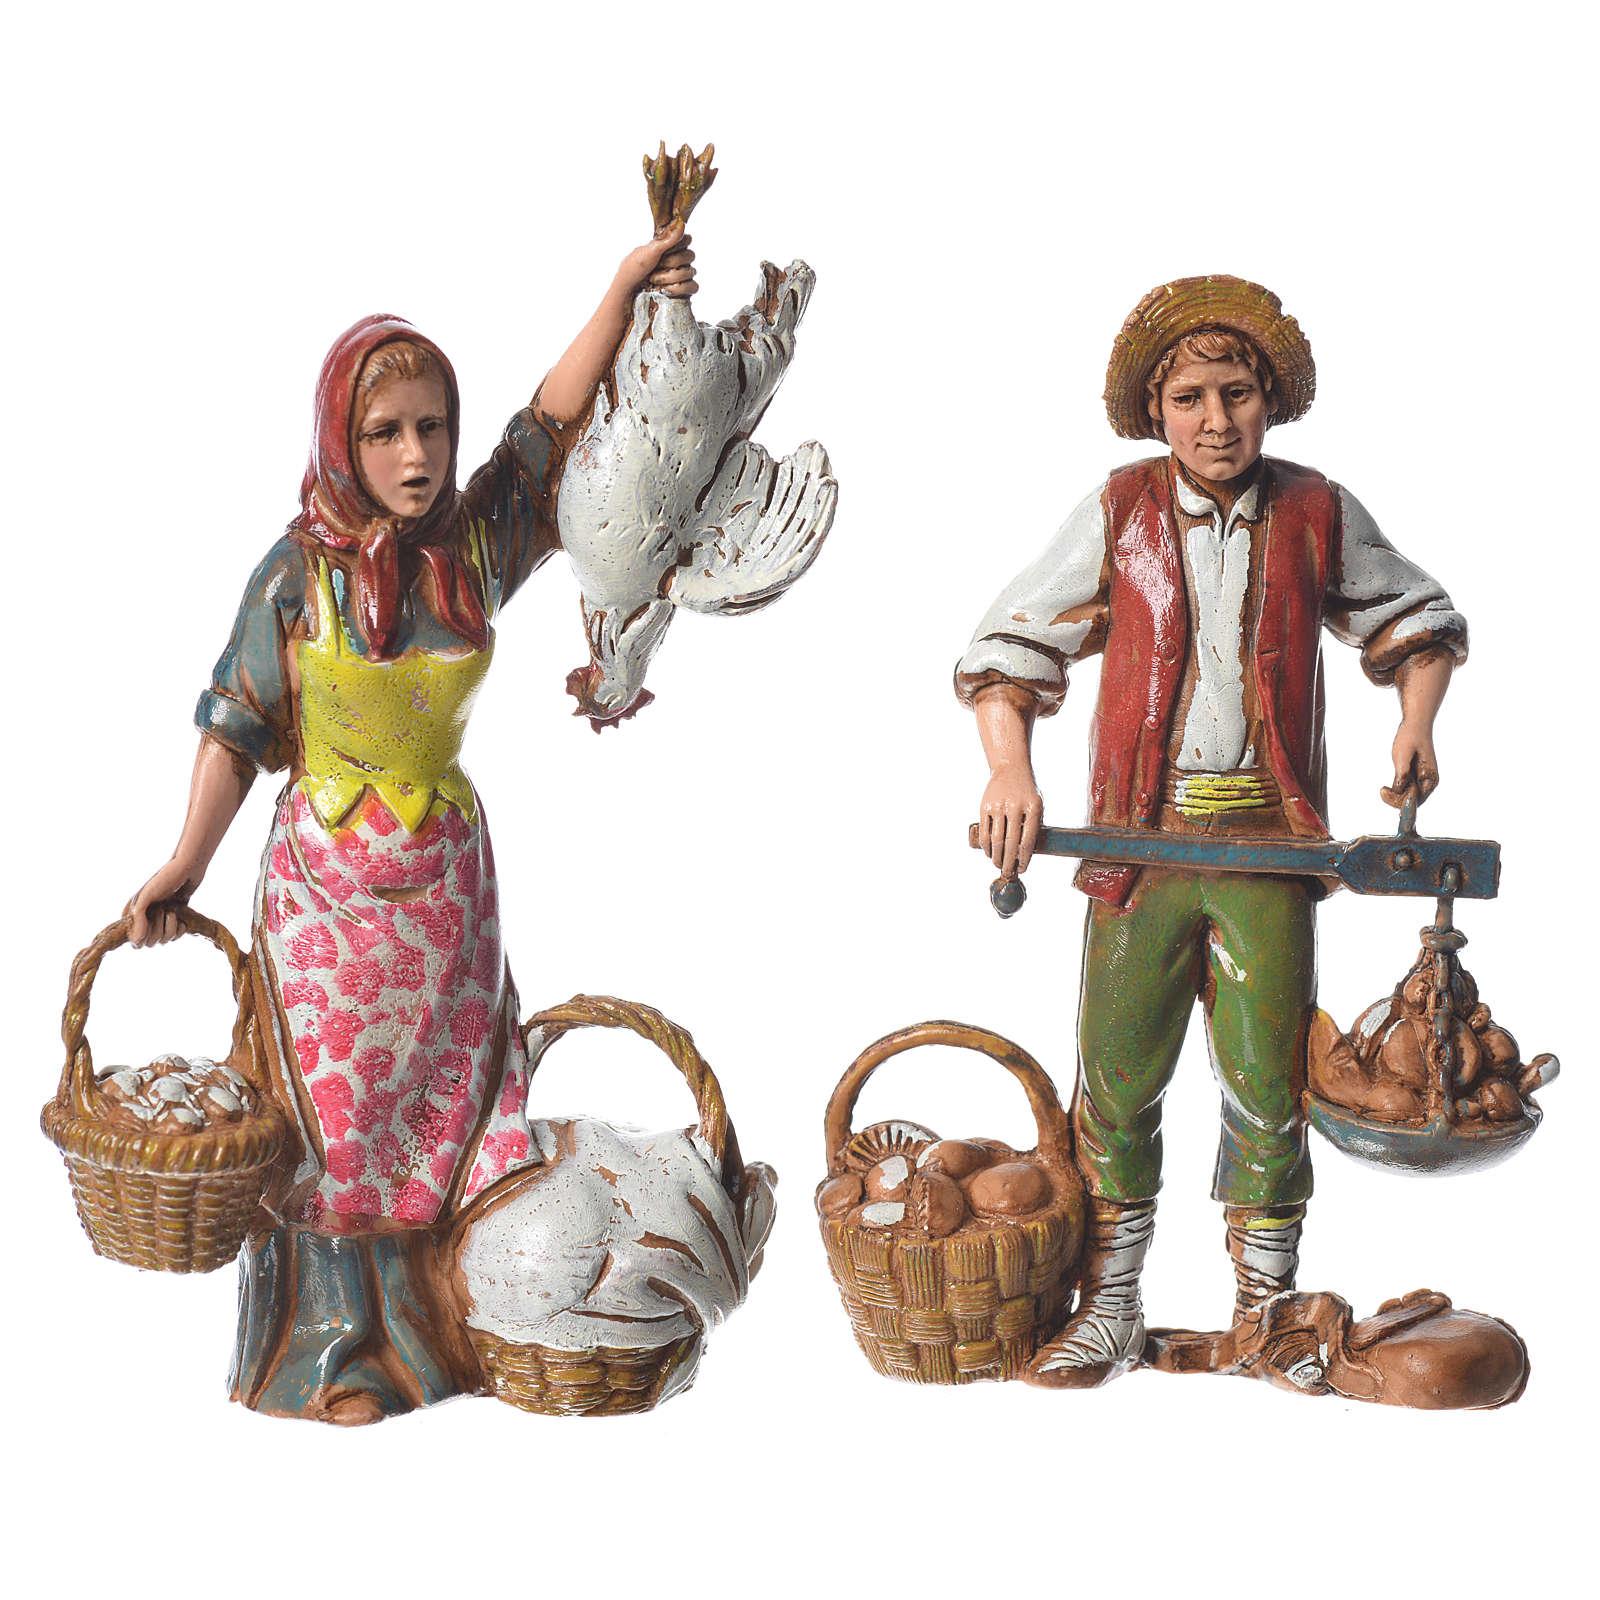 Pastori costumi napoletani Moranduzzo 10 cm 6pz 4